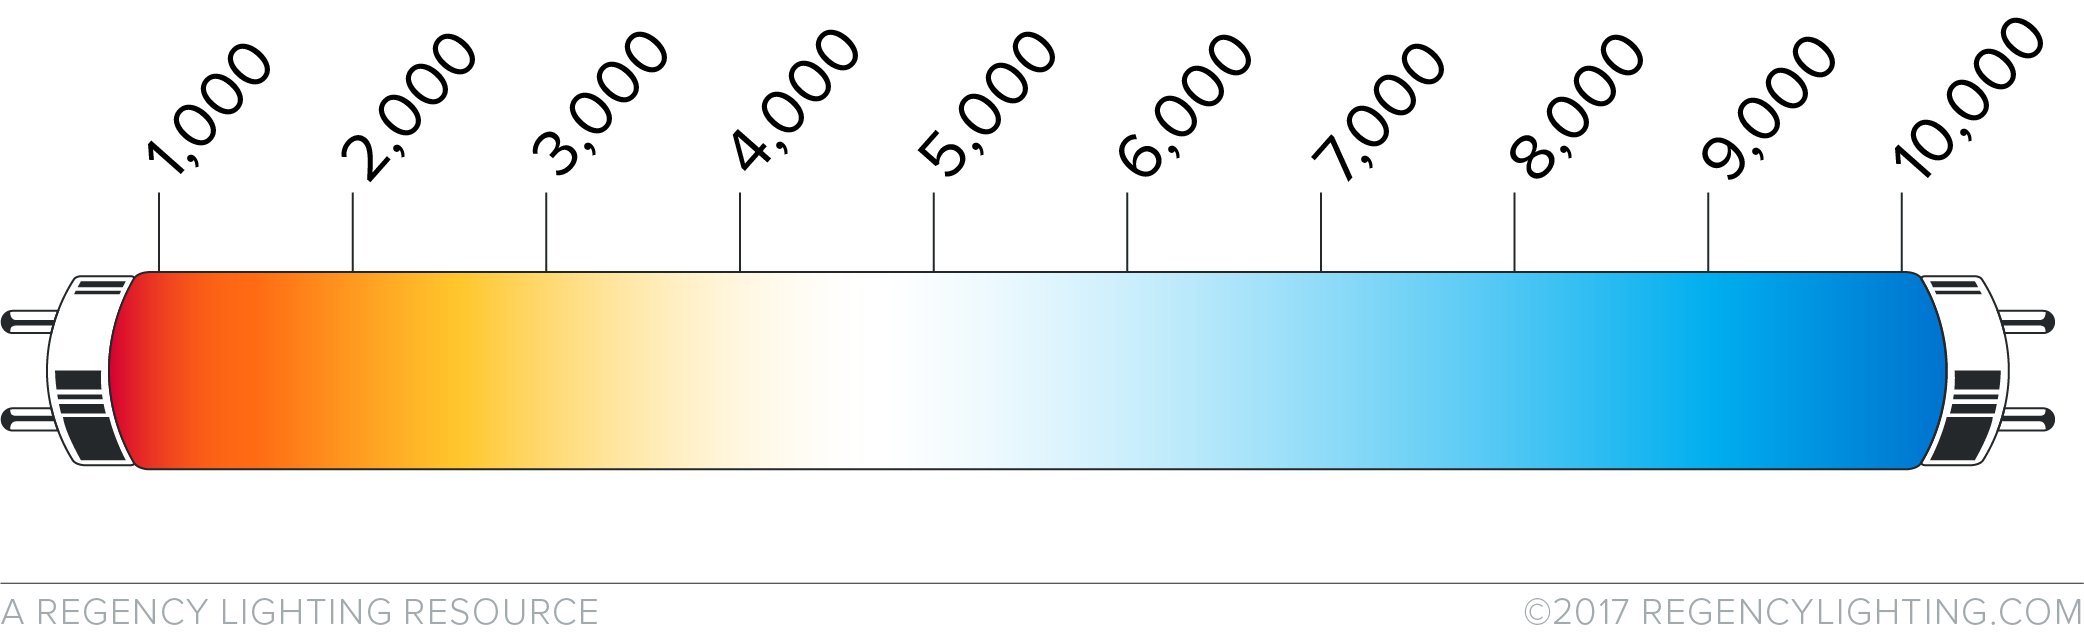 Kelvin-Scale-Color-Temperature-Horiz-R